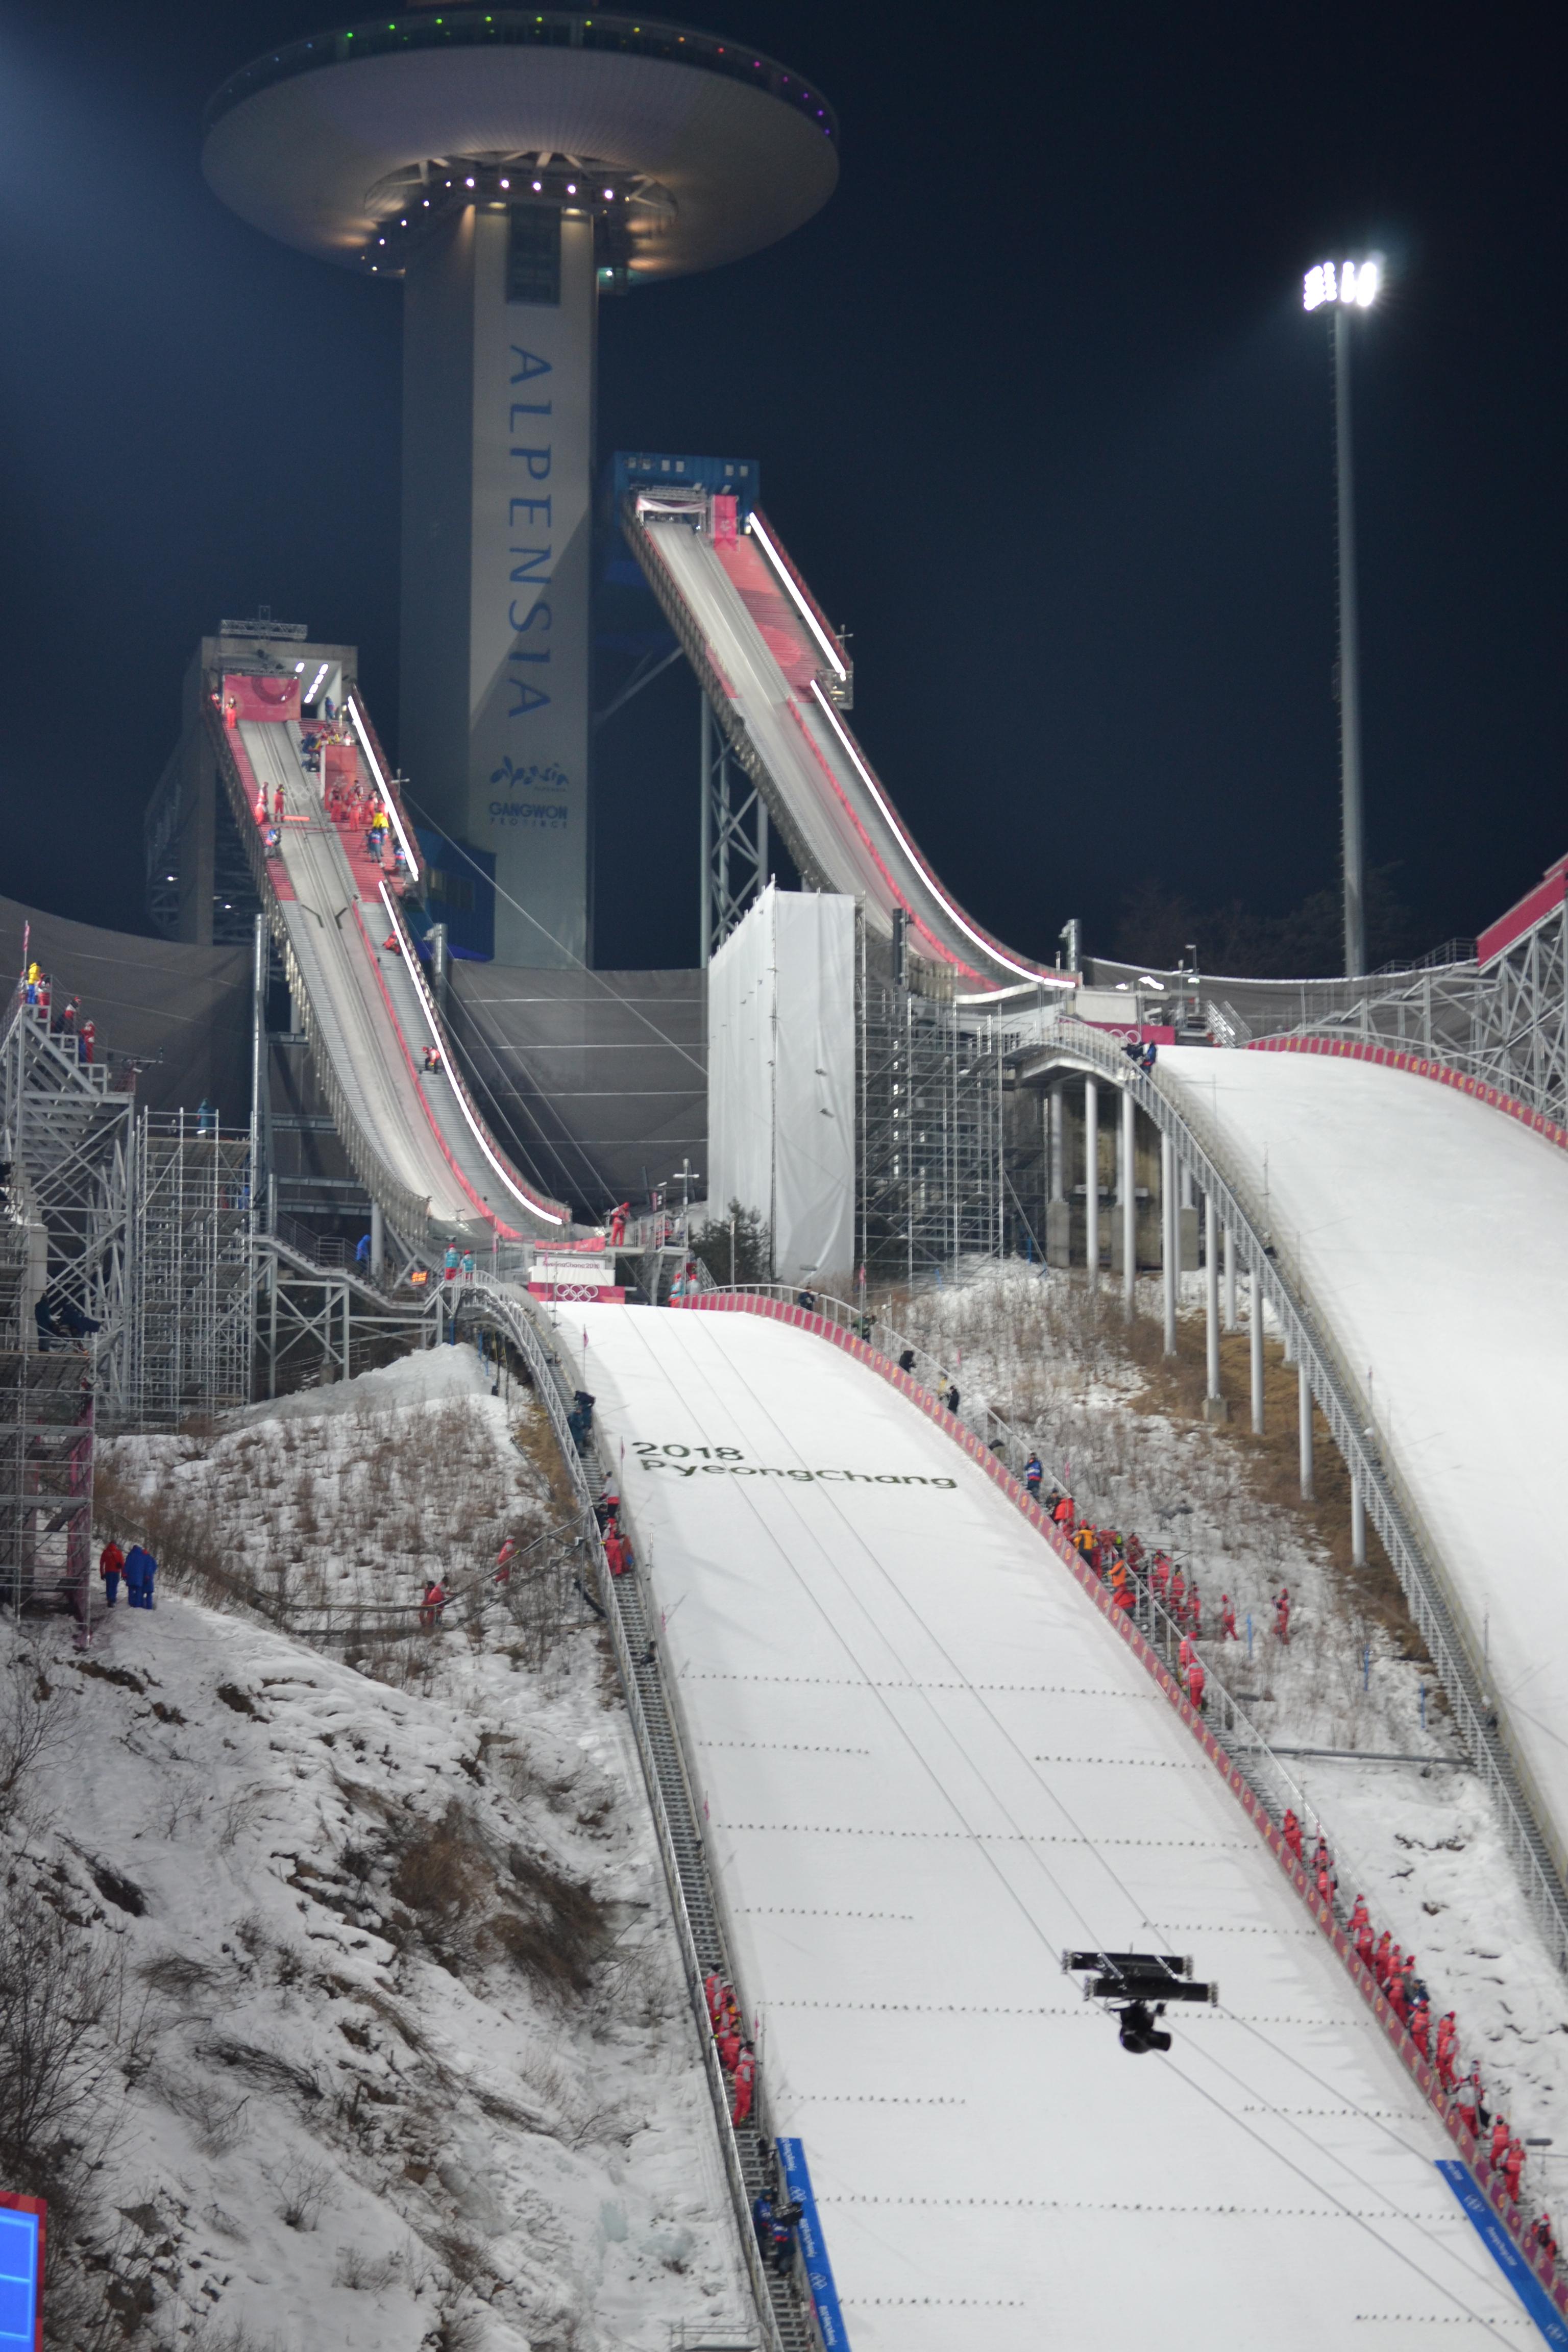 ski jumping live